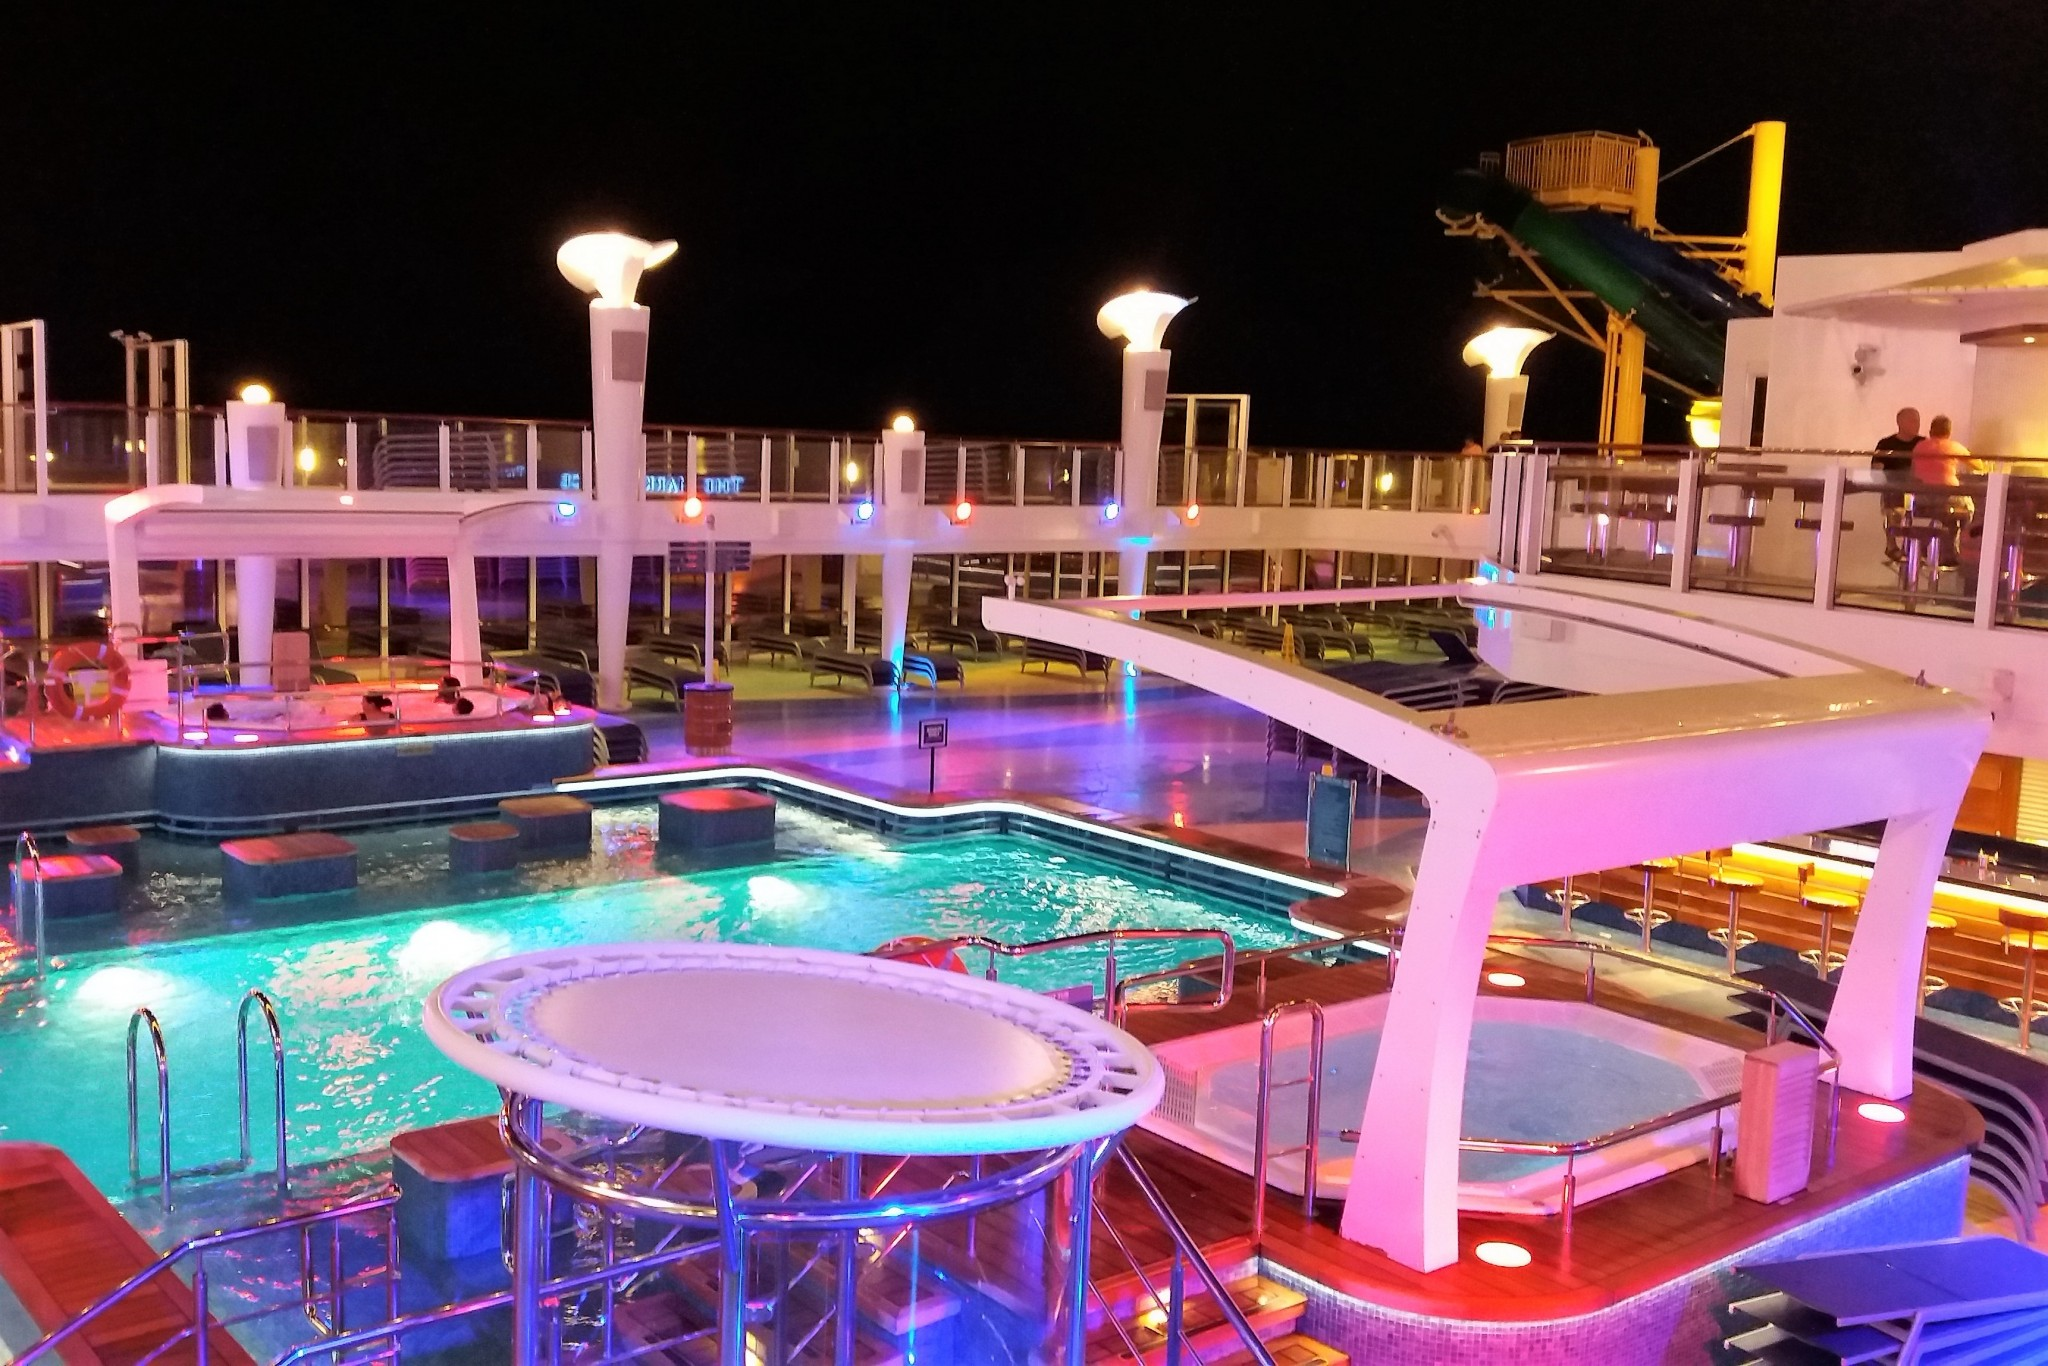 Norwegian Escape Pool Deck